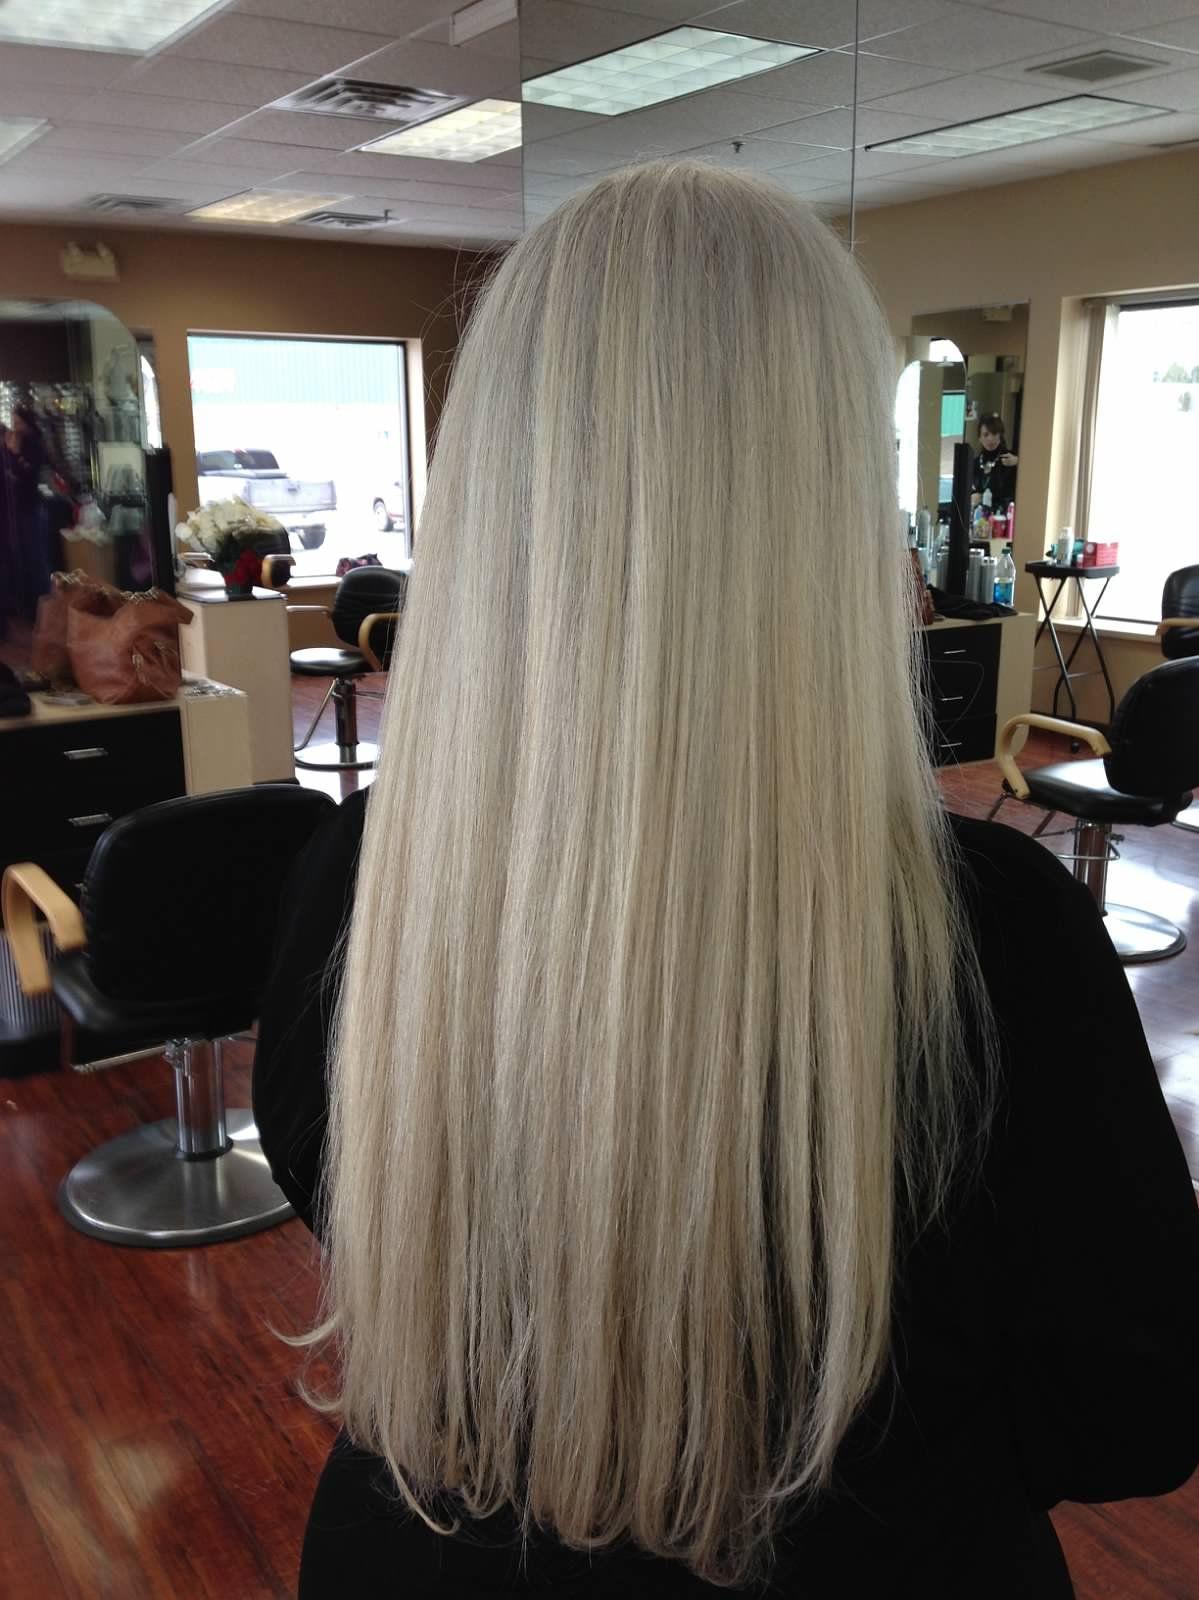 Blonde Highlighted Hair Returned To Natural White Portfolio